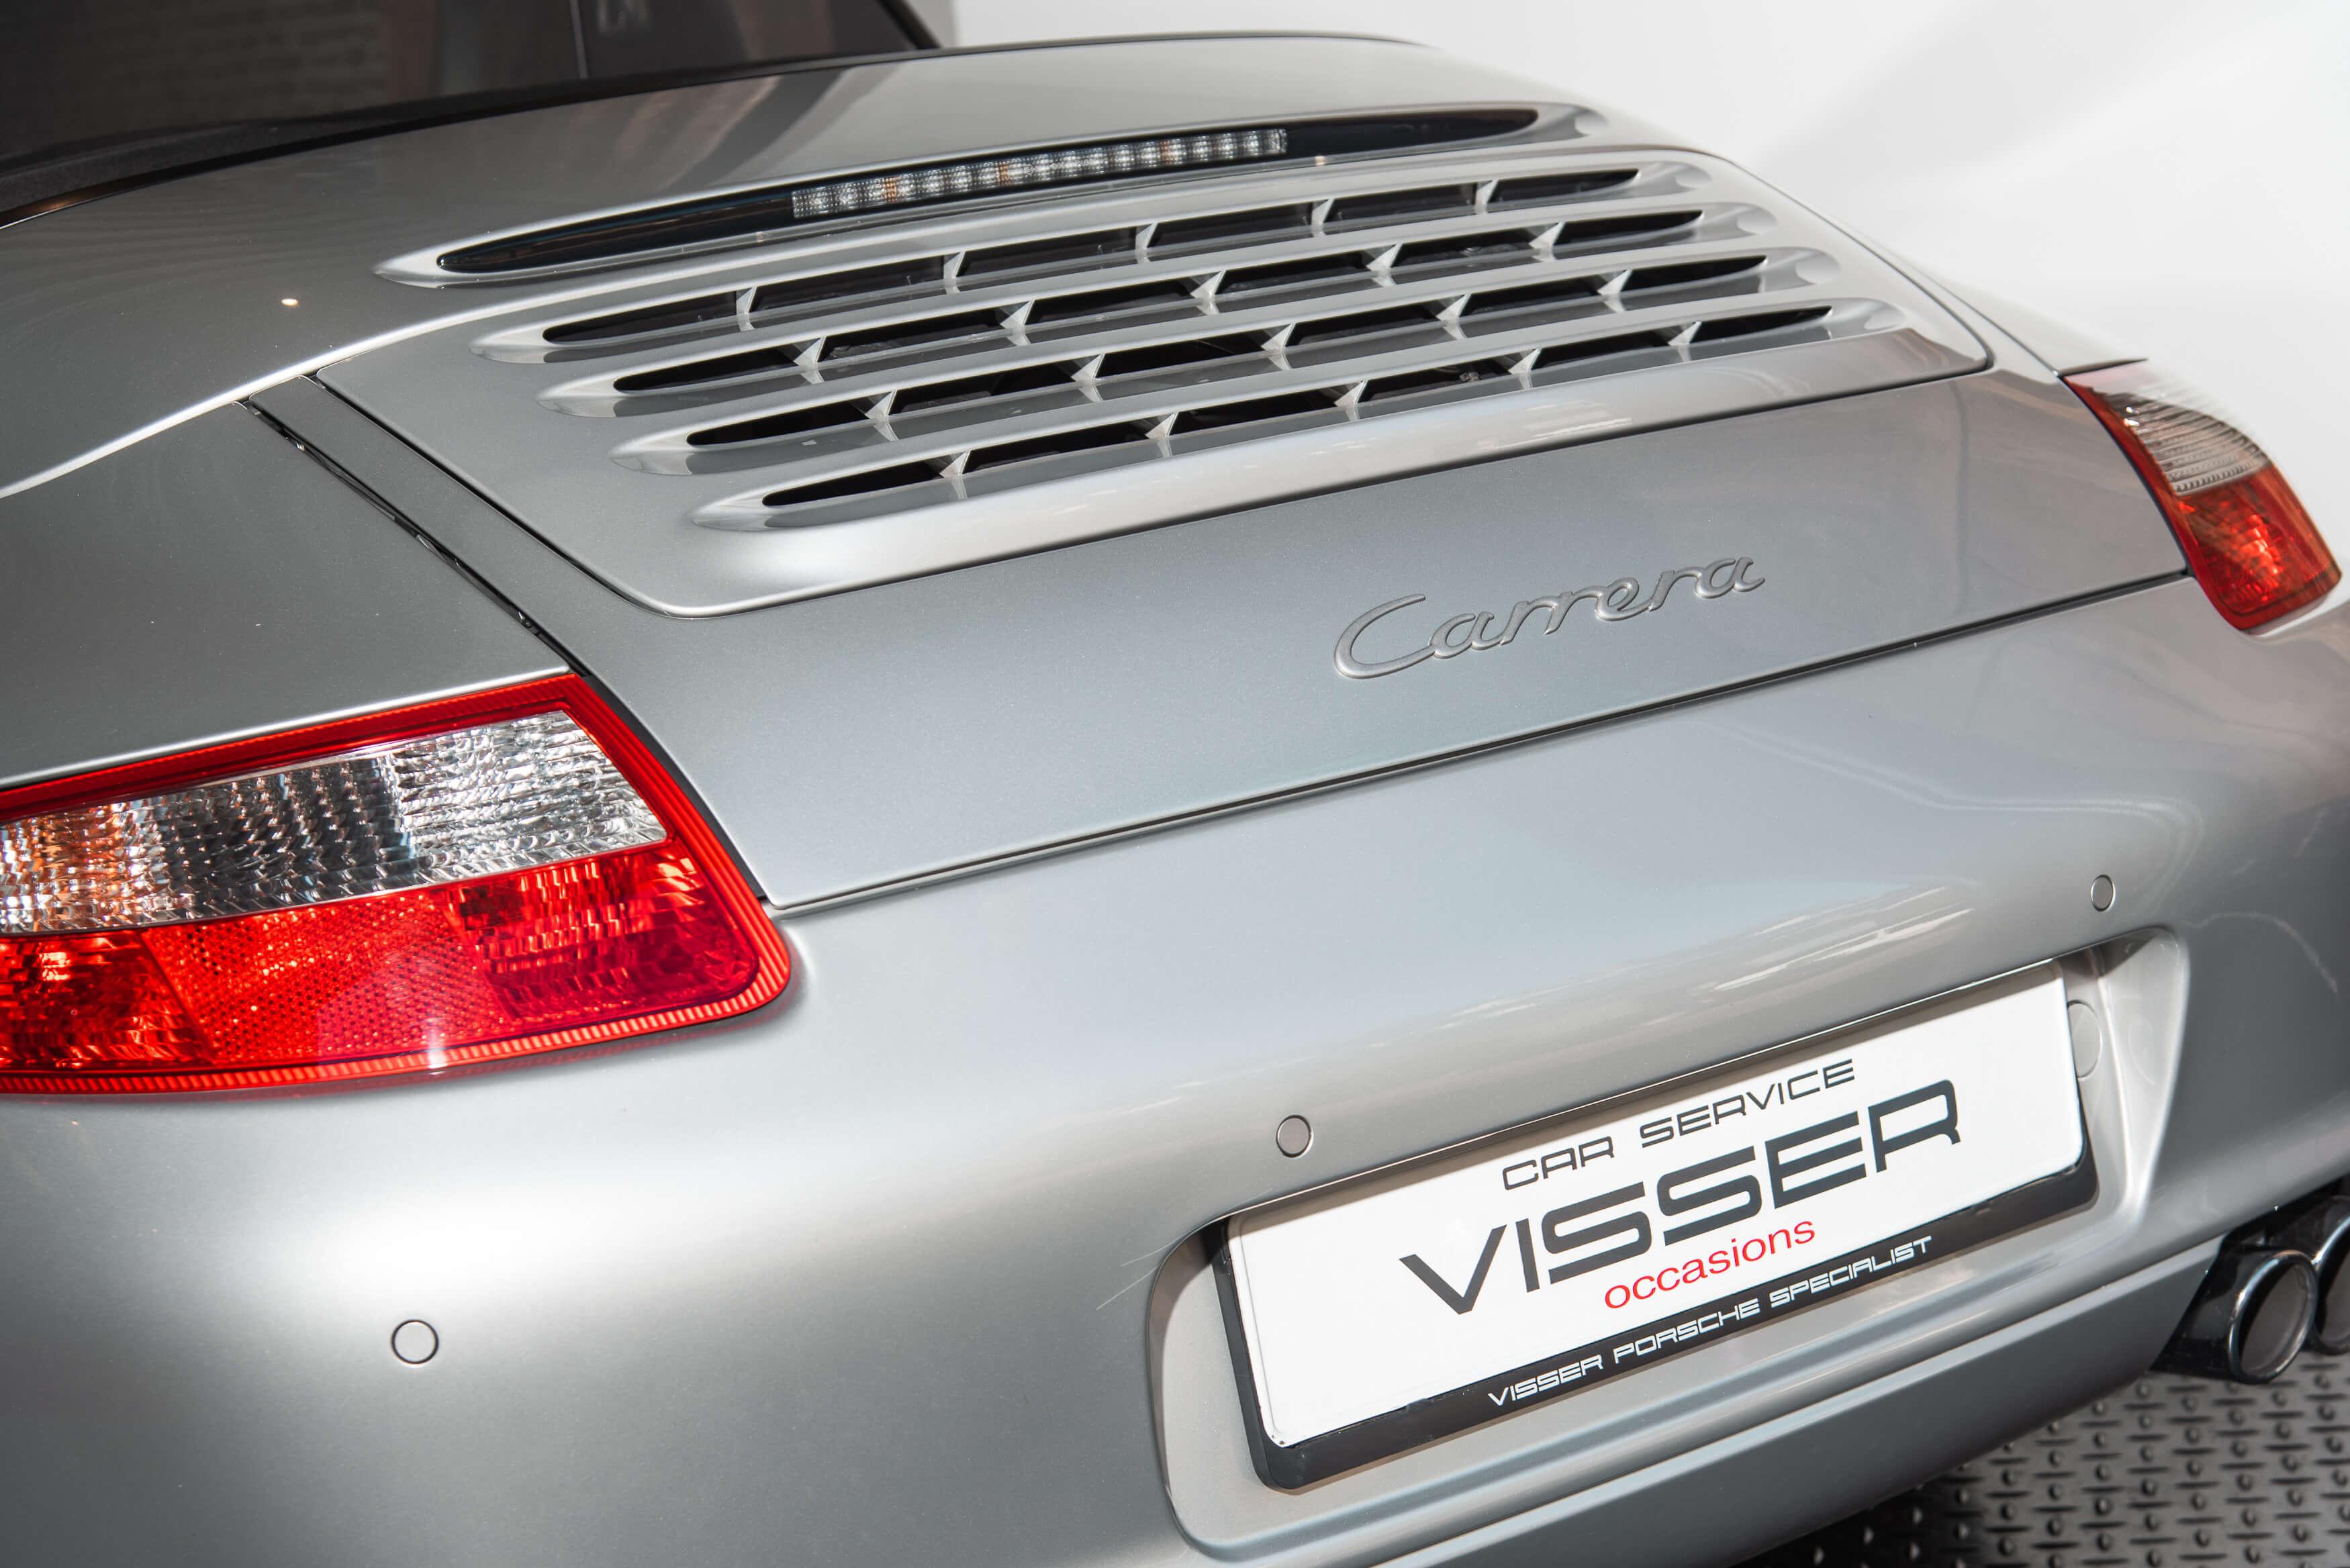 Porsche 997 Carrera 2 automaat Car Service Visser gespecialiseerd in Porsche - 11